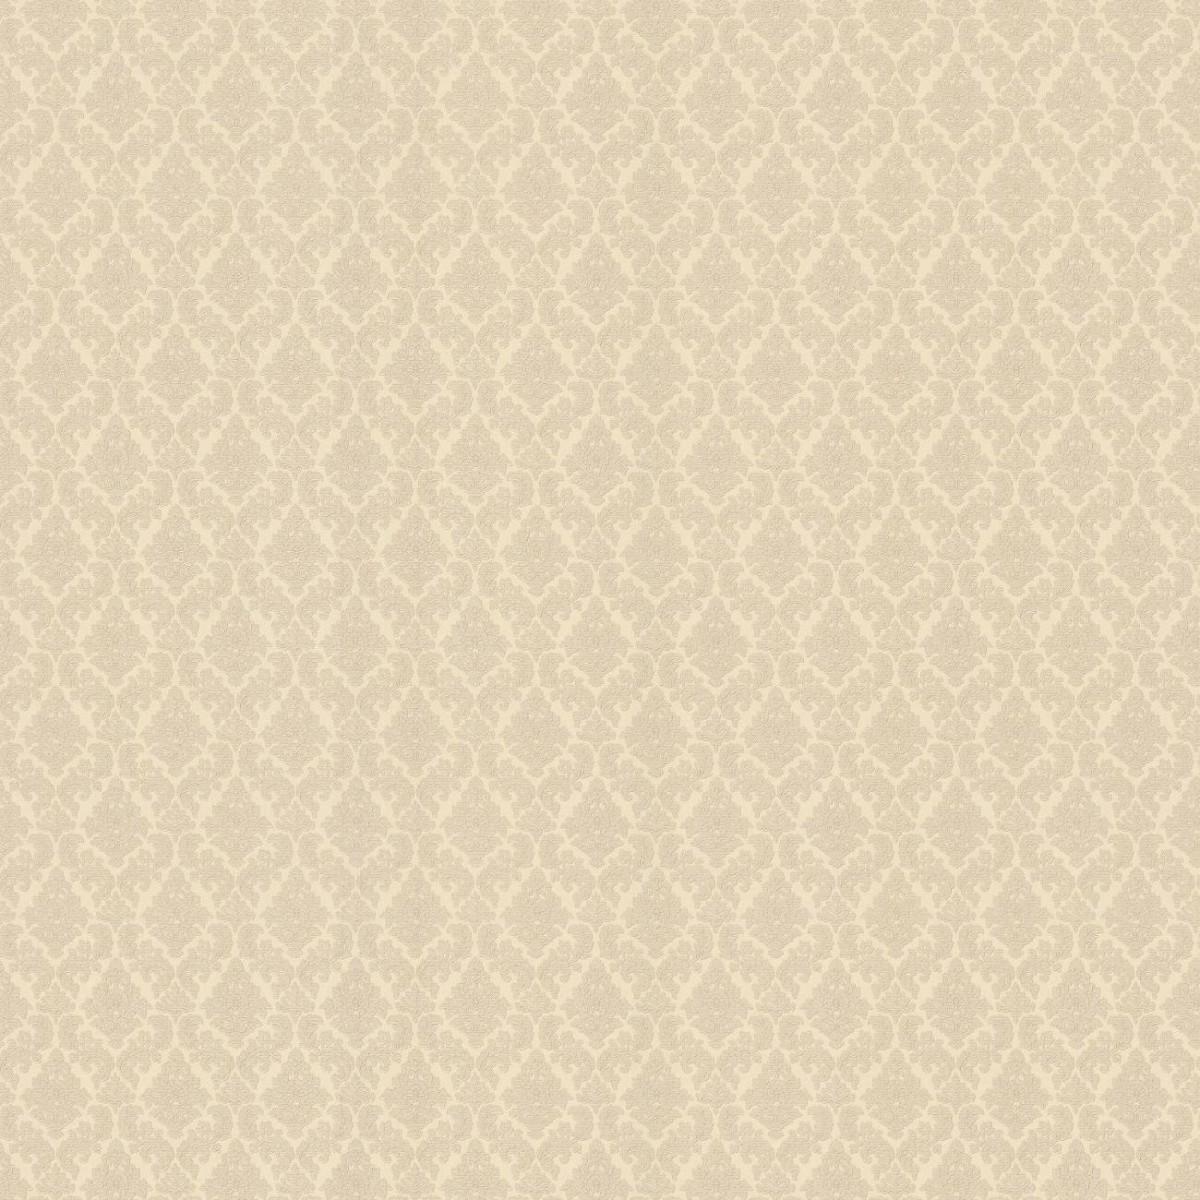 Обои флизелиновые Мир Авангард бежевые 1.06 м 45-218-02